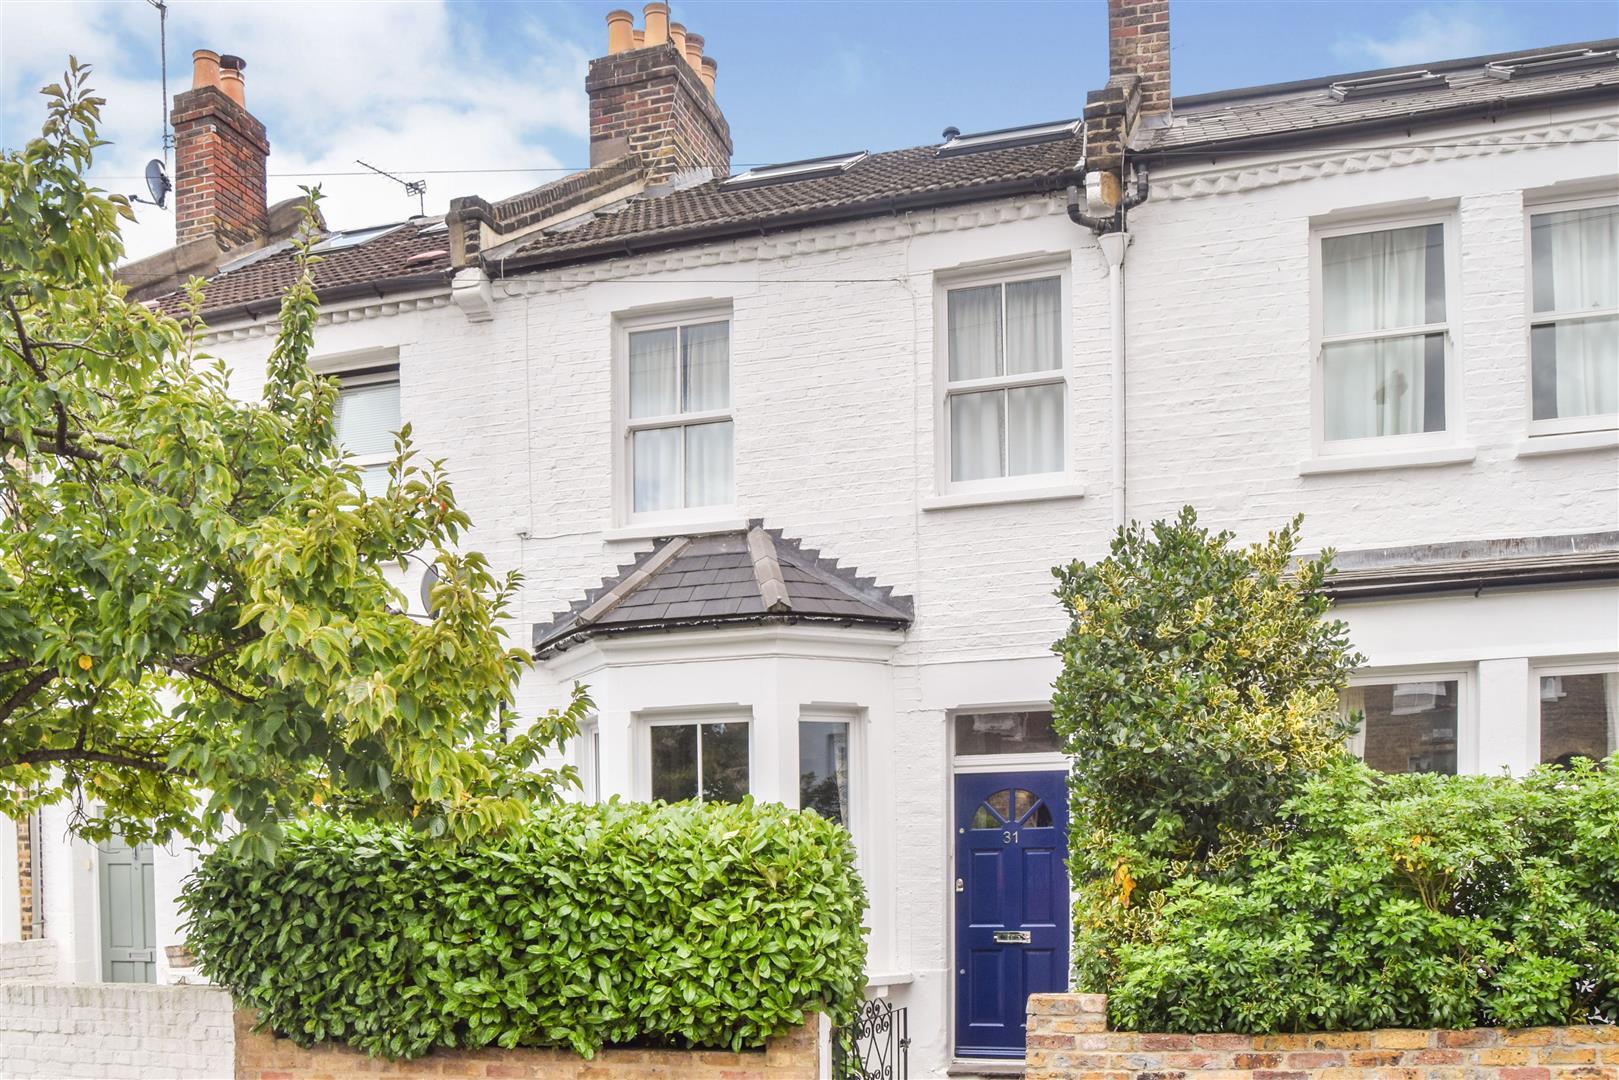 Palmerston Road, Wimbledon